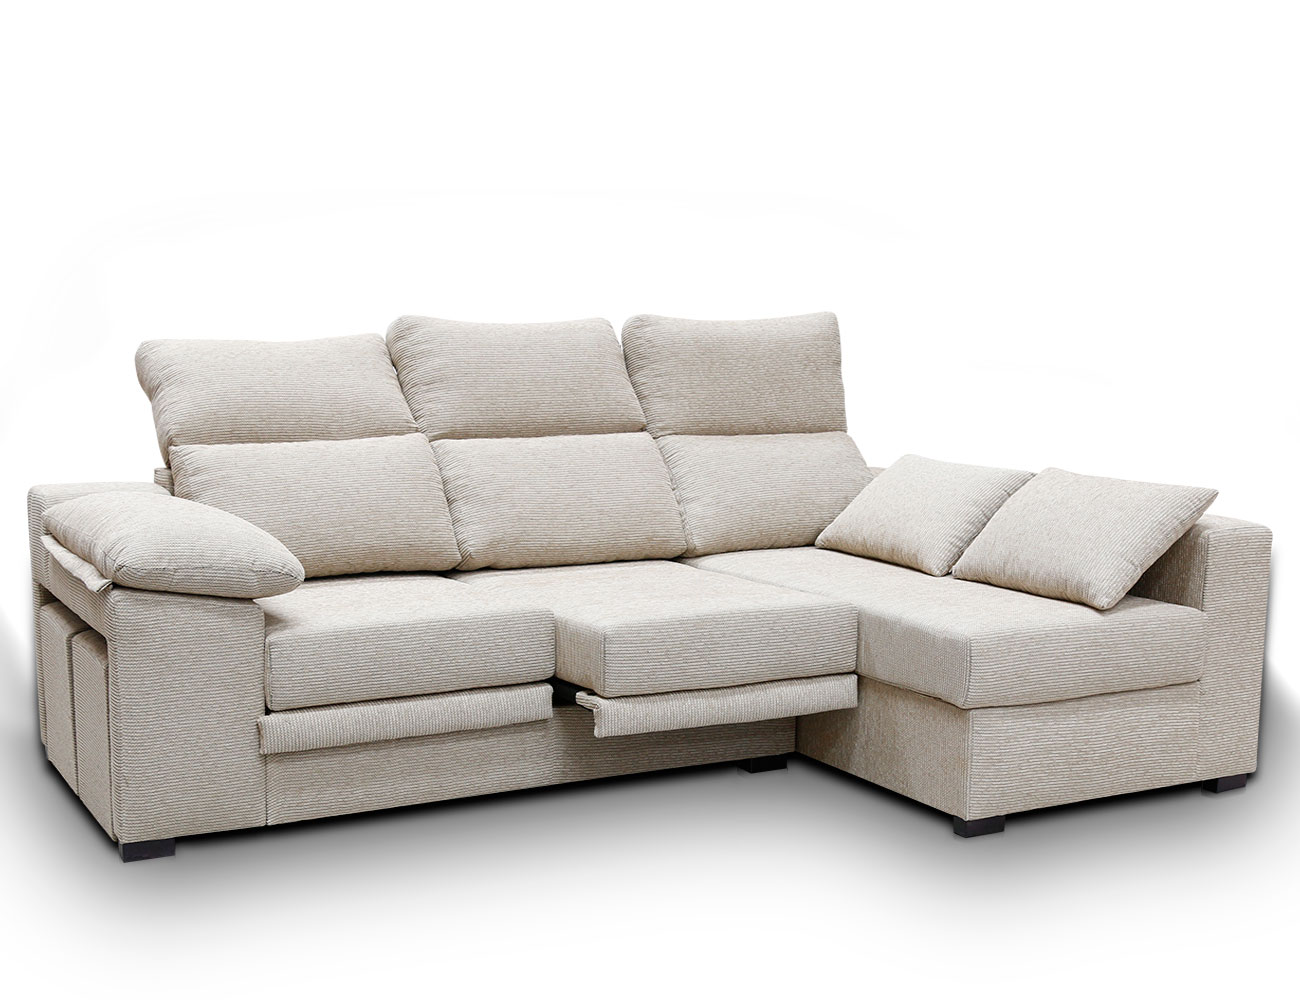 Sof chaiselongue con asientos extraibles respaldos for Sillones decorativos baratos